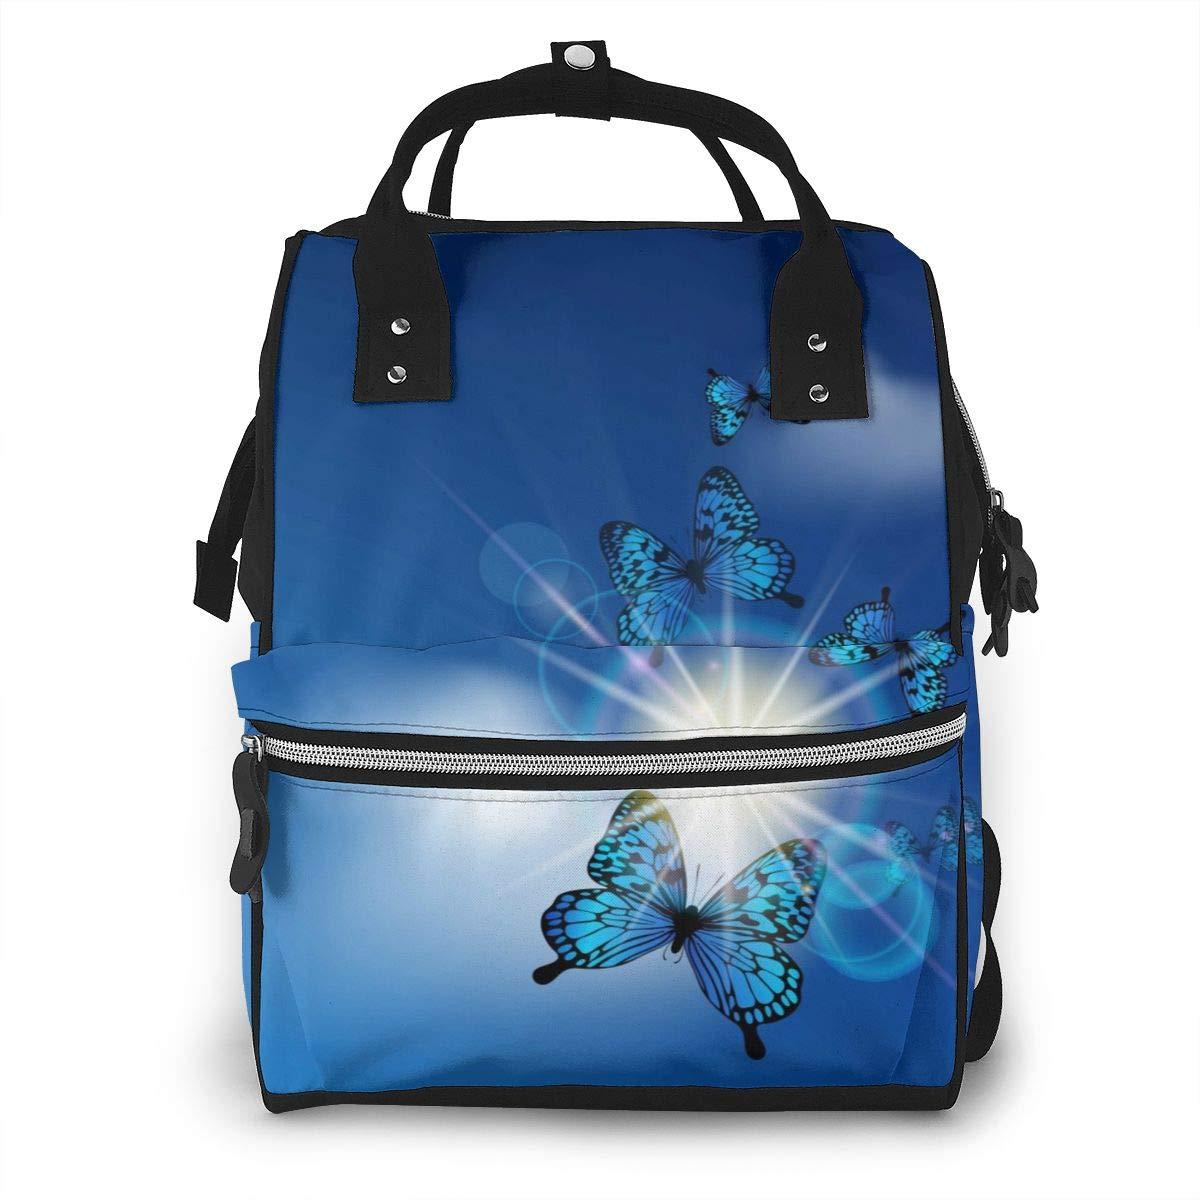 Sunshine Blue ButterflyDiaper Bag Bookbag School Shoulder Multi Functional Stylish Large Backpack Capacity Nappy Bags Mummy Durable Travel